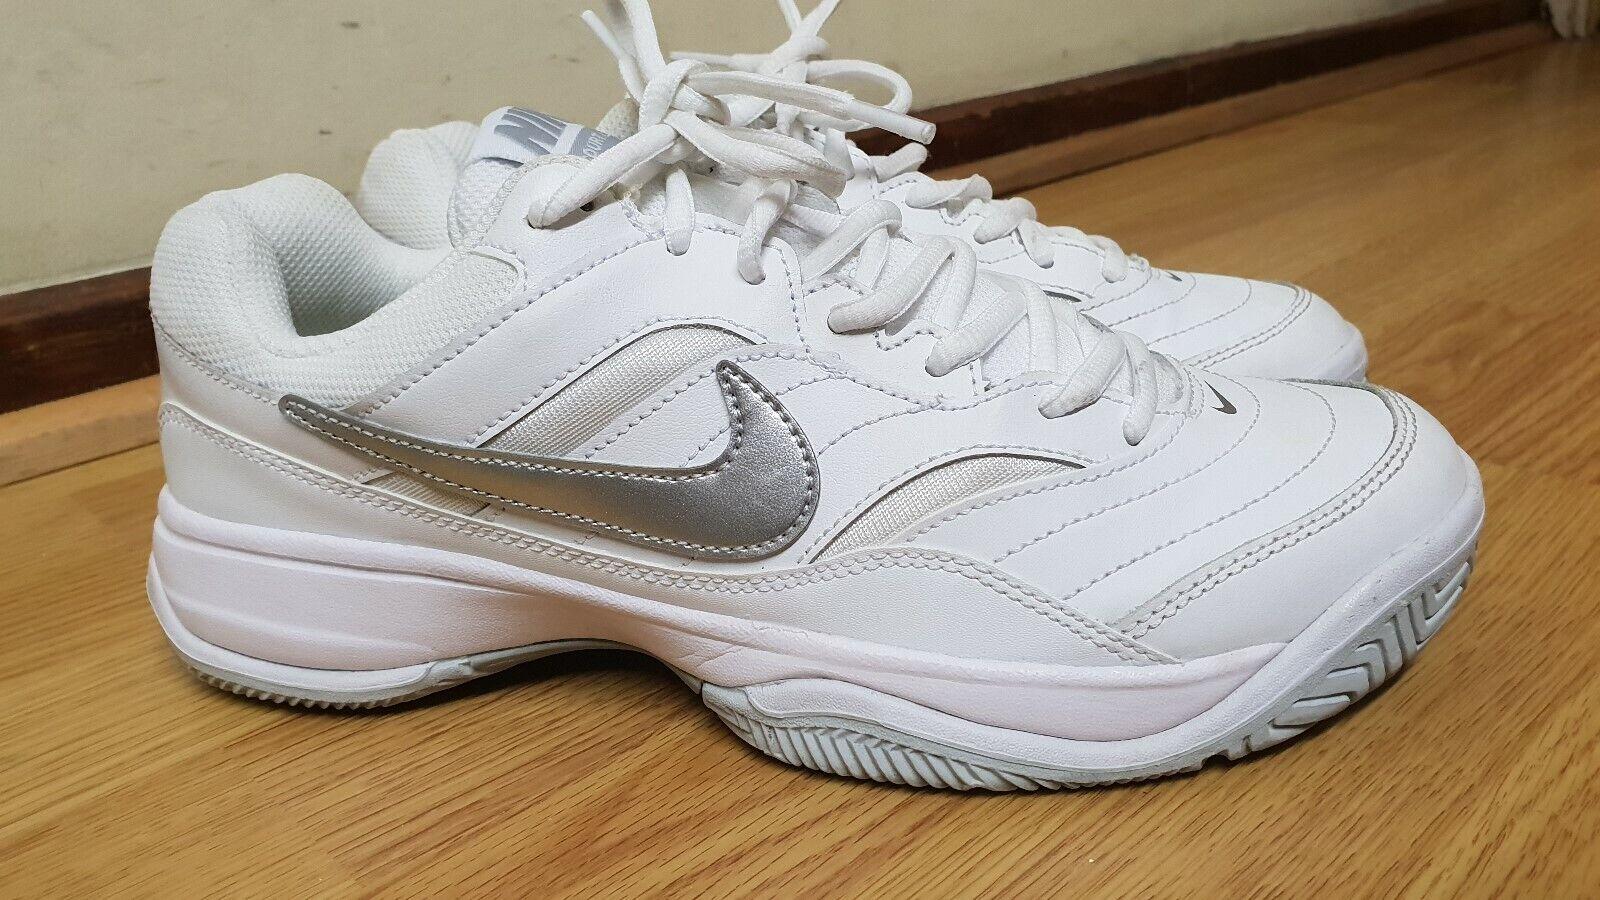 a0d22b24ea8 NIKE COURT LITE MENS WHITE TRAINERS SIZE nopflf2786-Athletic Shoes ...